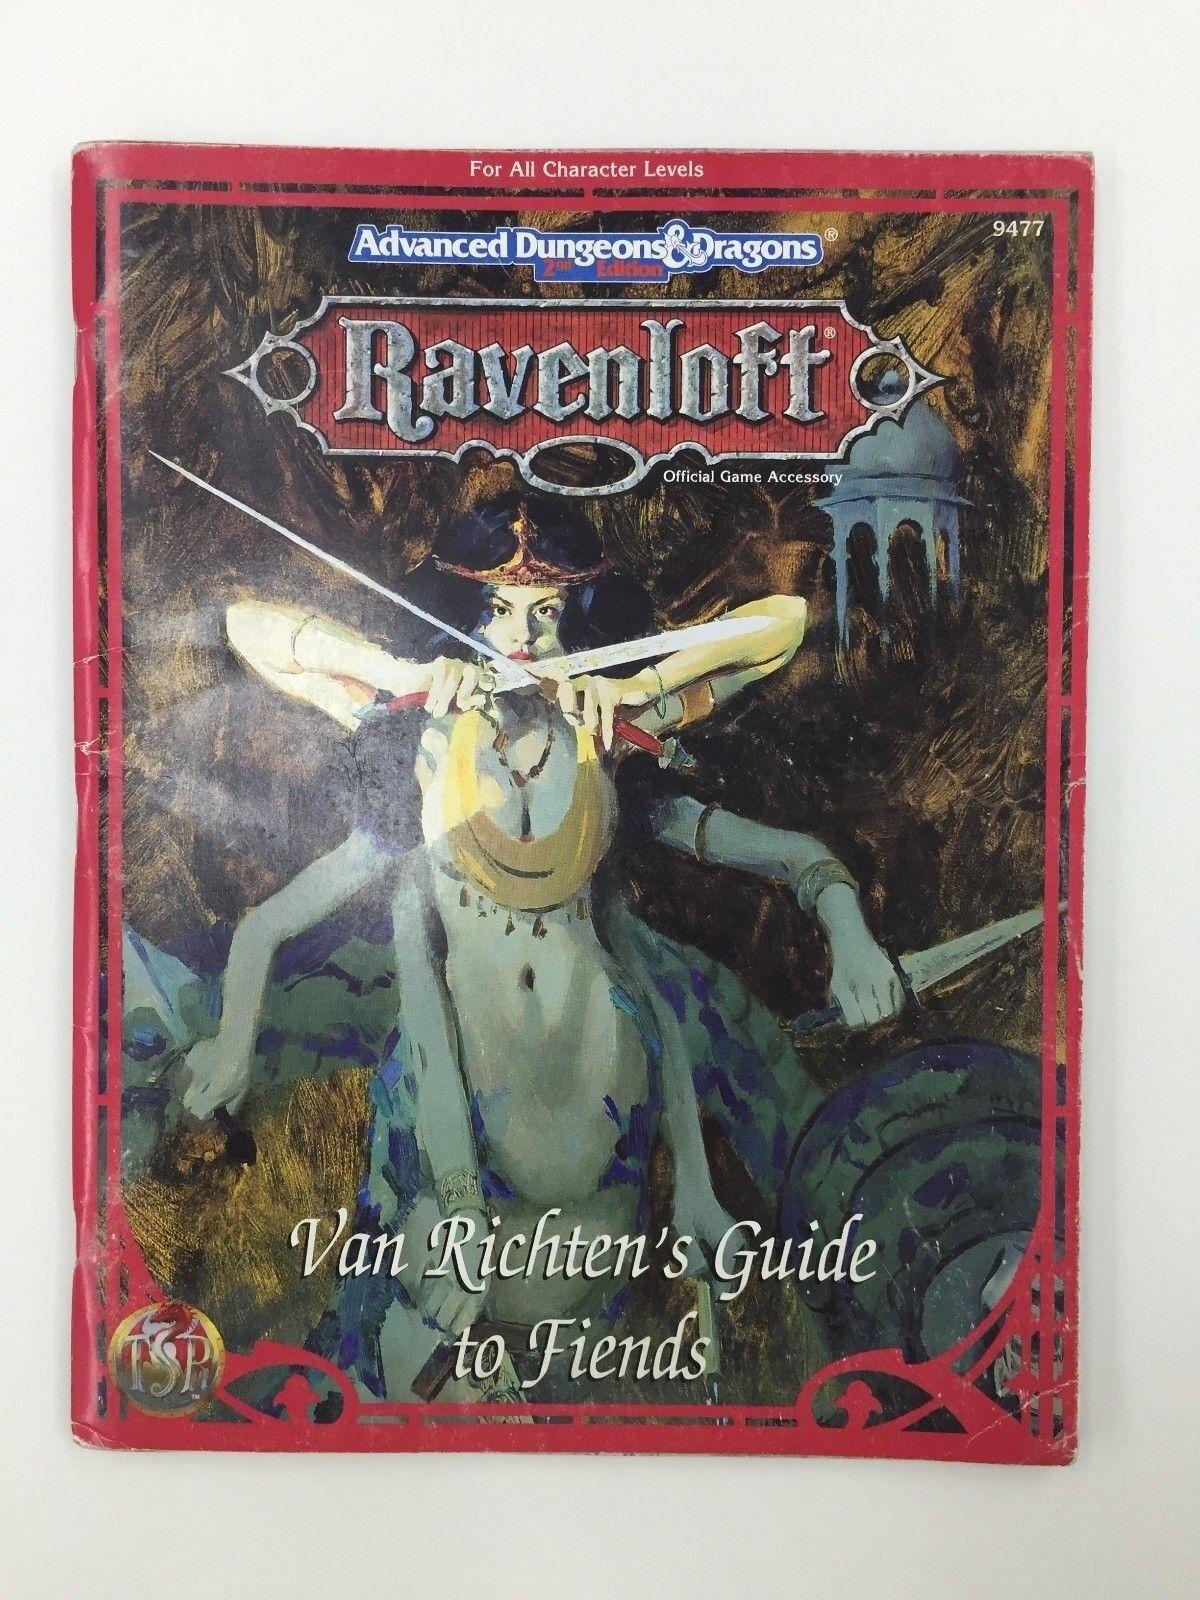 TSR ADVANCED DUNGEONS & DRAGONS DRAGONS DRAGONS RAVENLOFT VAN RICHTEN'S GUIDE TO FIENDS 9477 5ccdbe